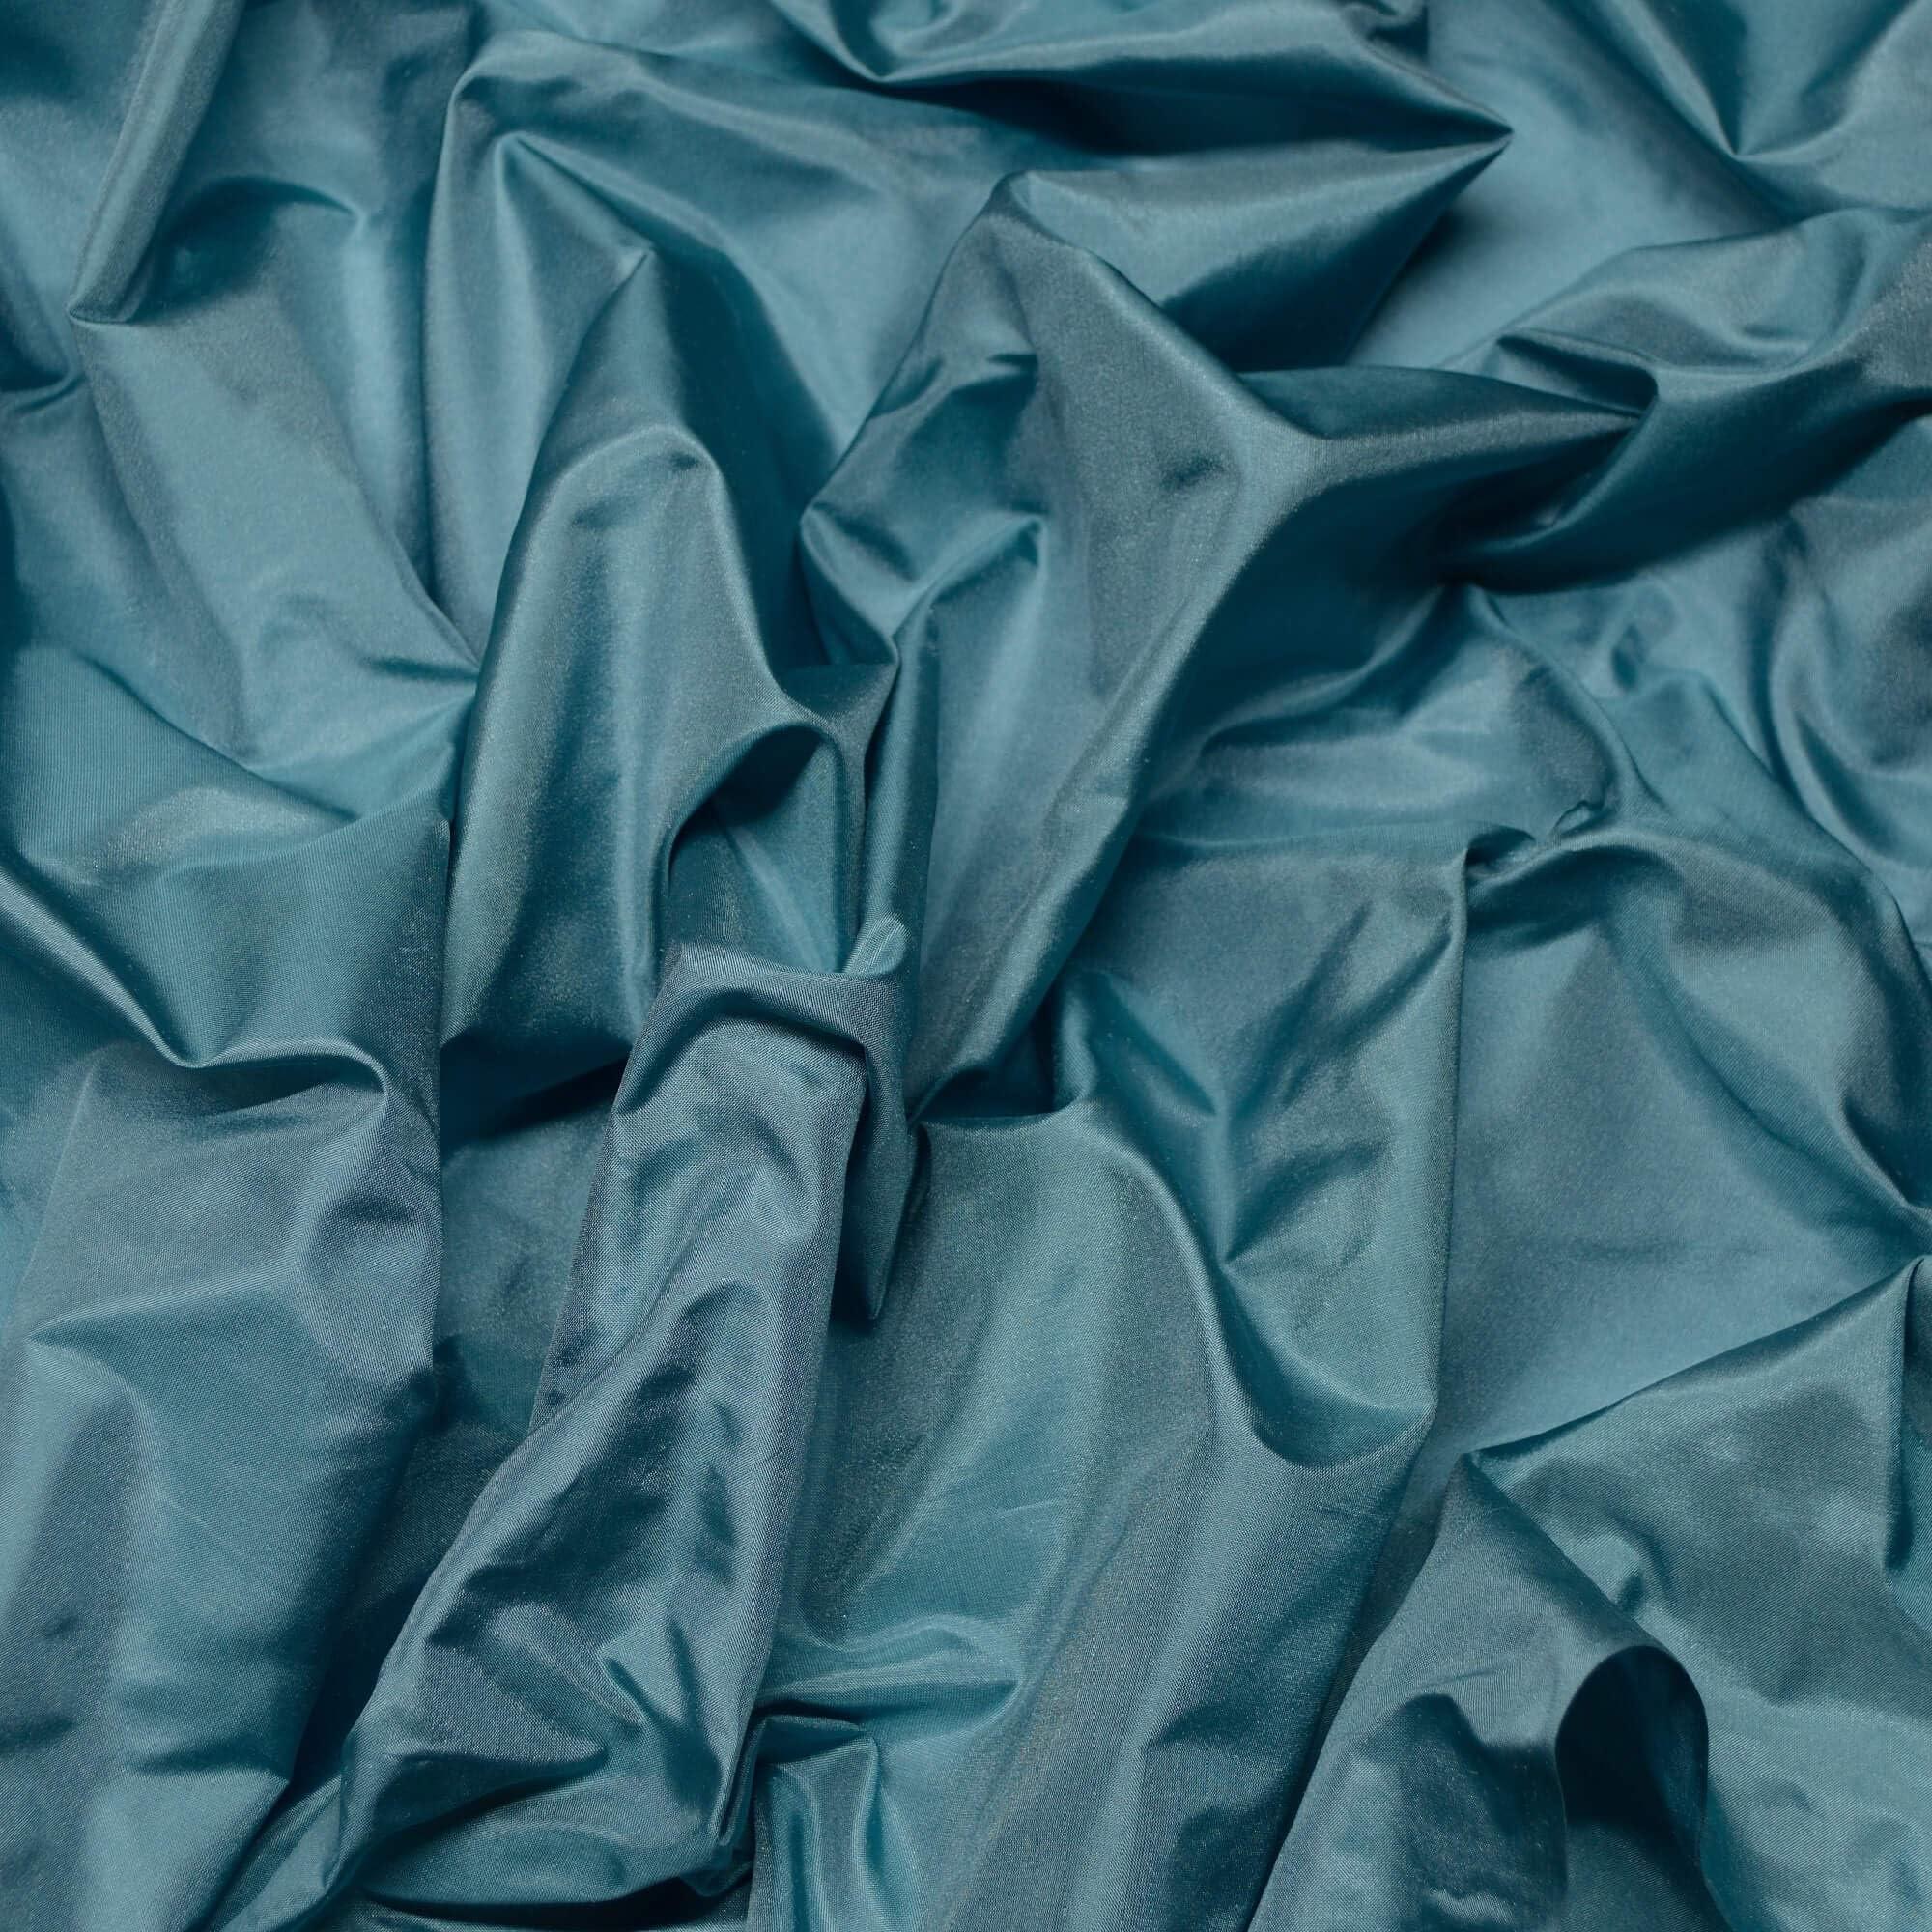 100/% Silk Taffeta Embroidery Fabric Teal /& Peach Iridescent 34 Yard Remnant